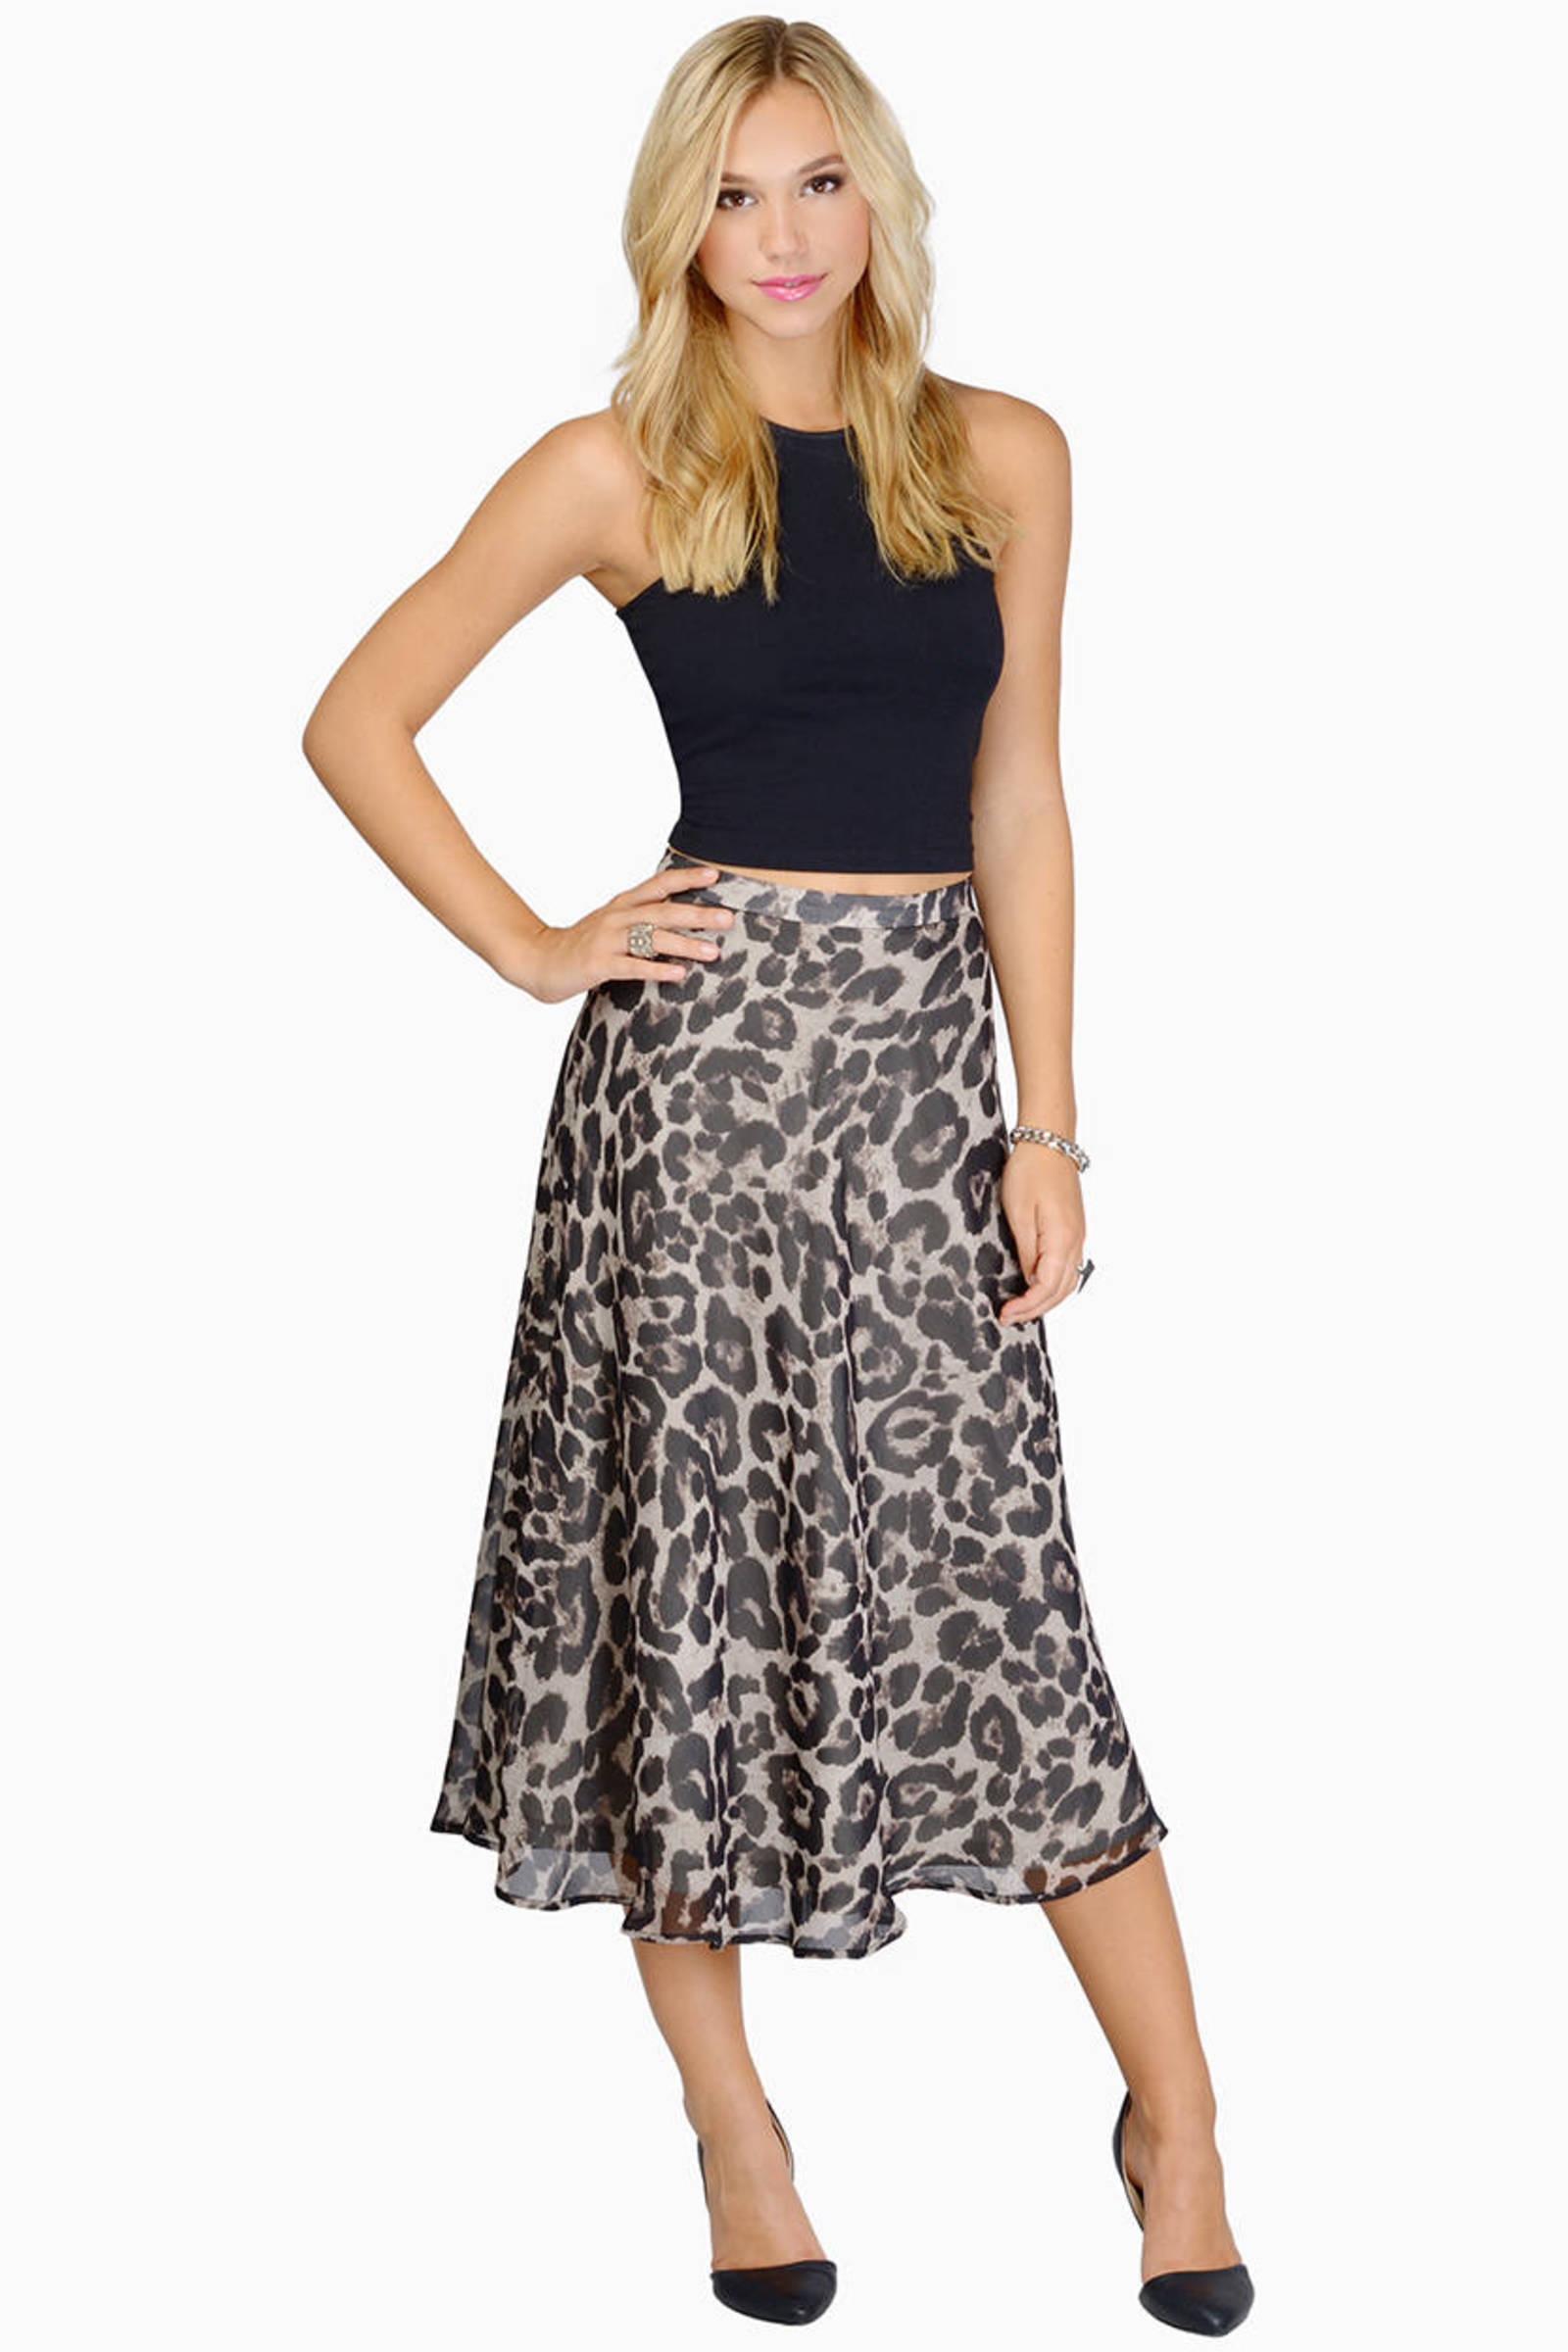 Black modern dress - Modern Day Toast Black Paneled Midi Skirt